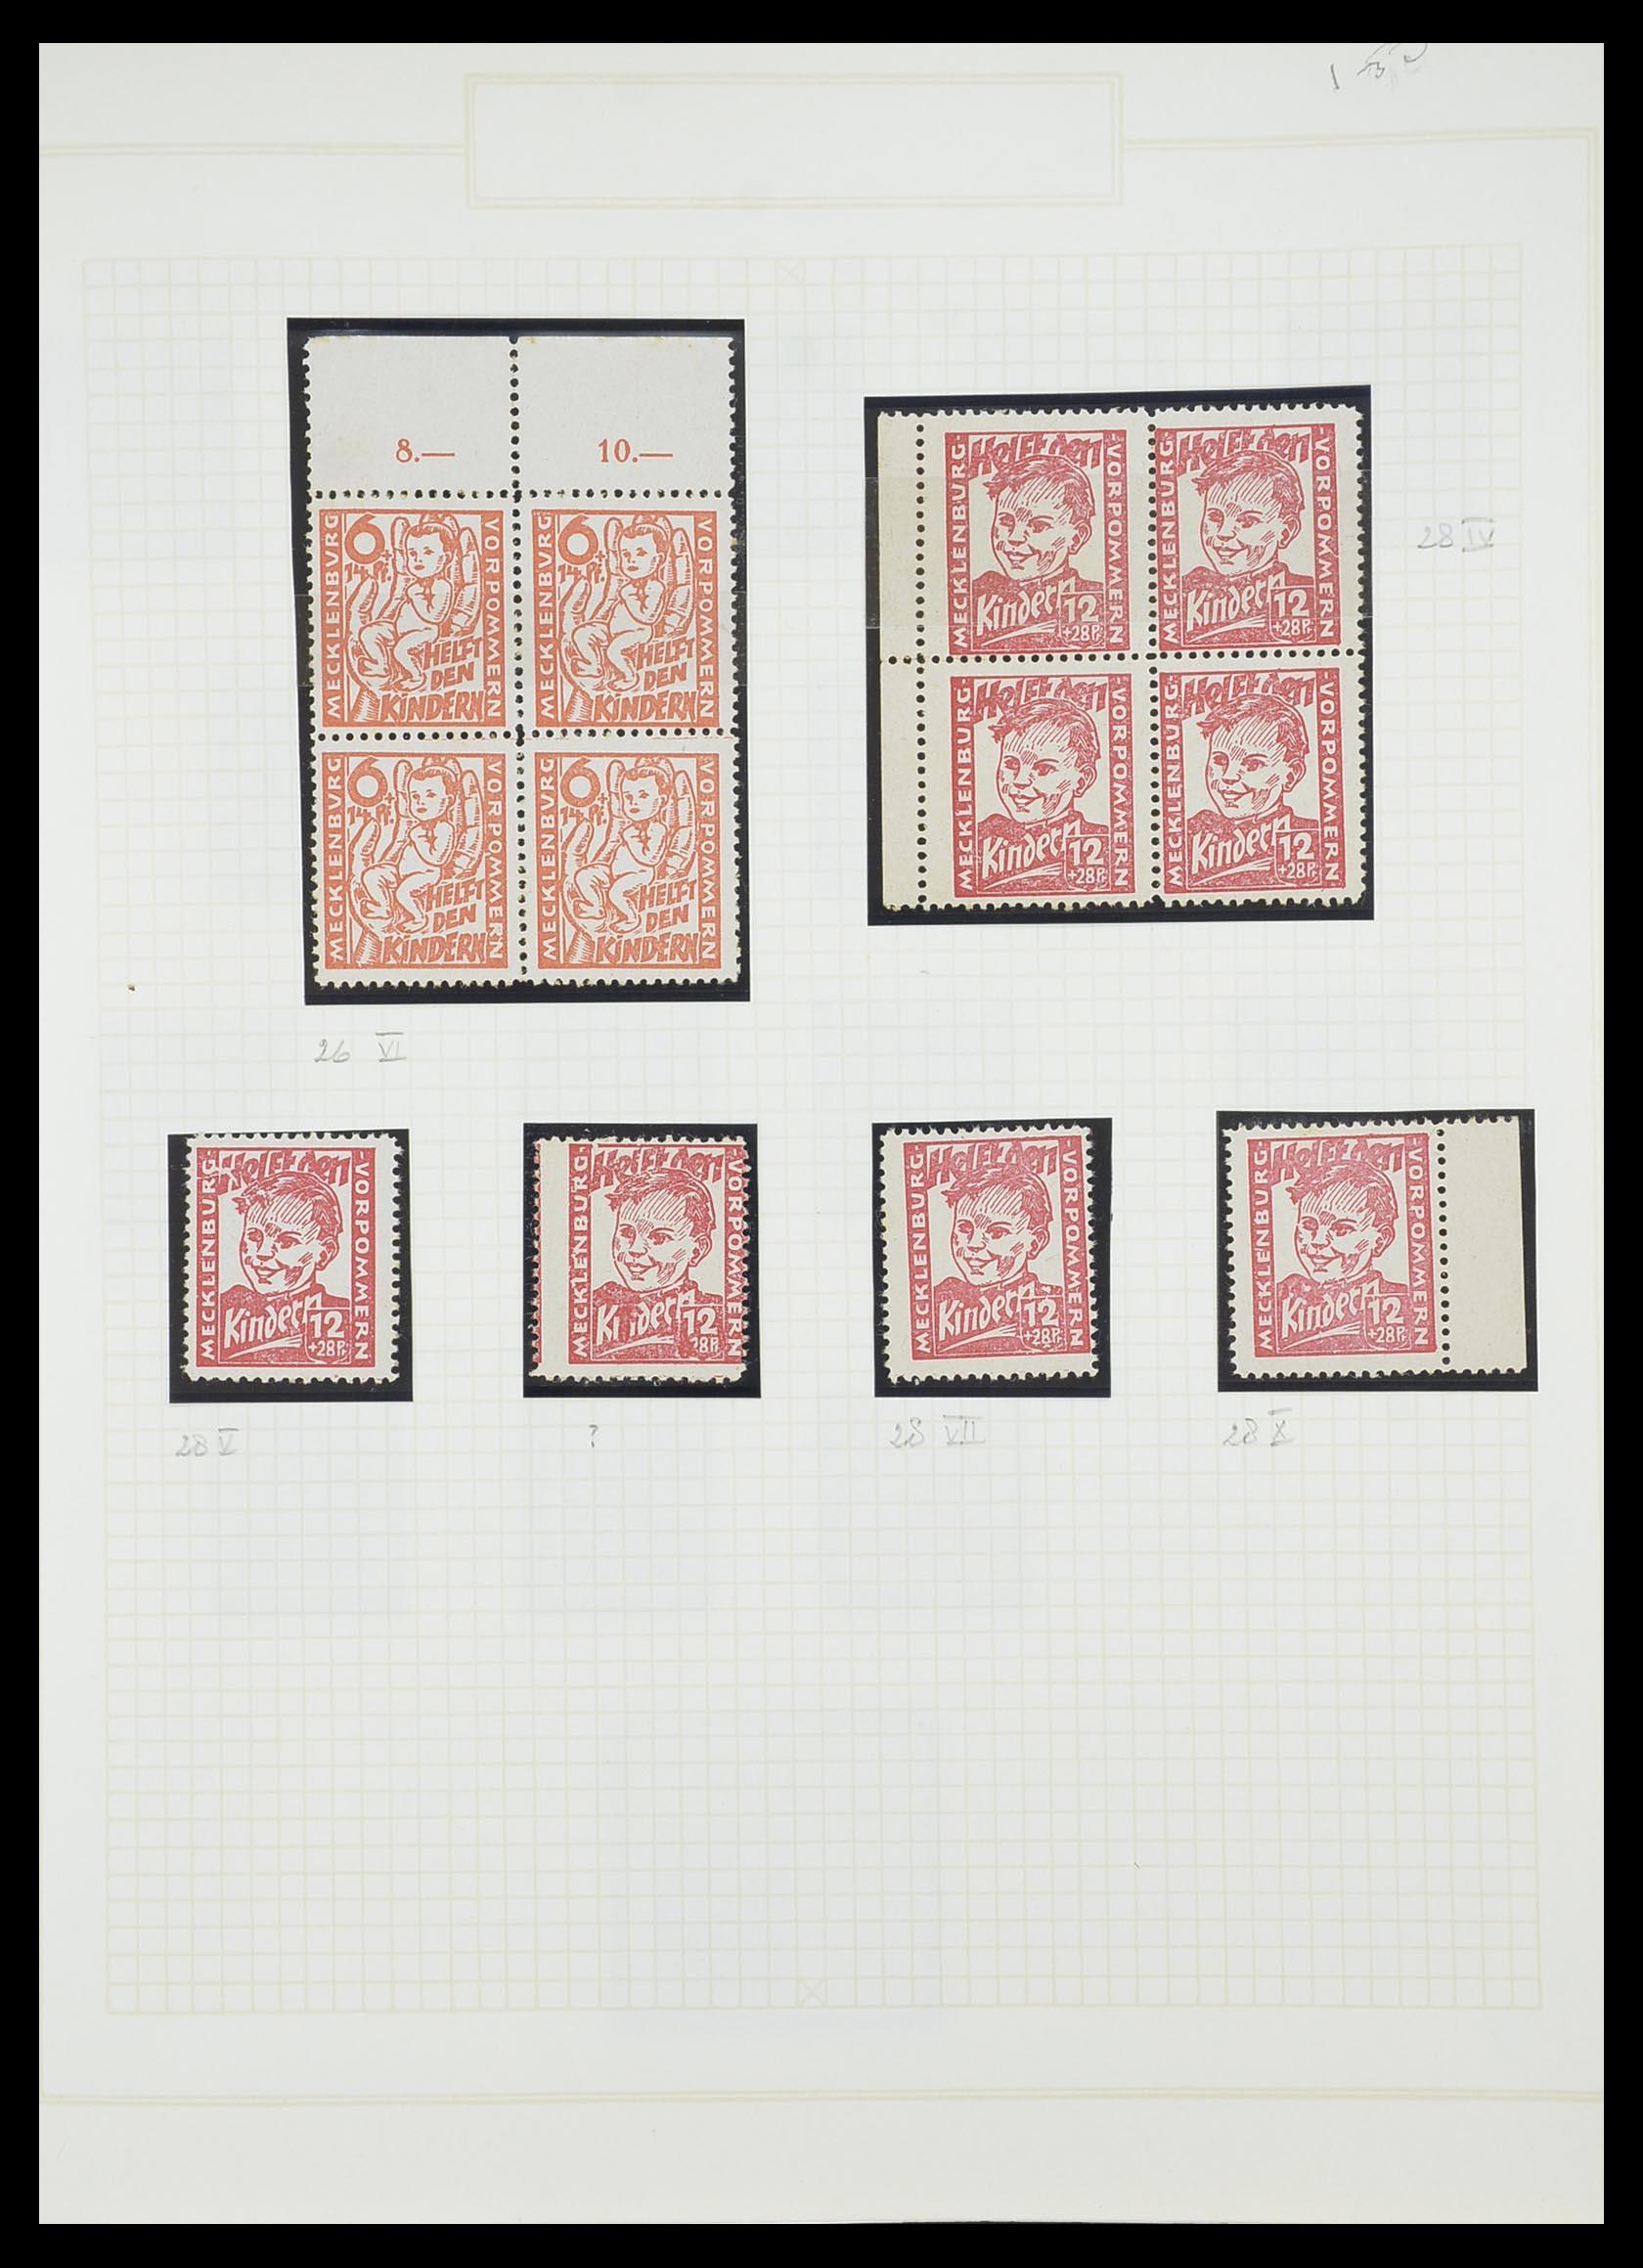 33698 014 - Postzegelverzameling 33698 Sovjet Zone 1945-1948.